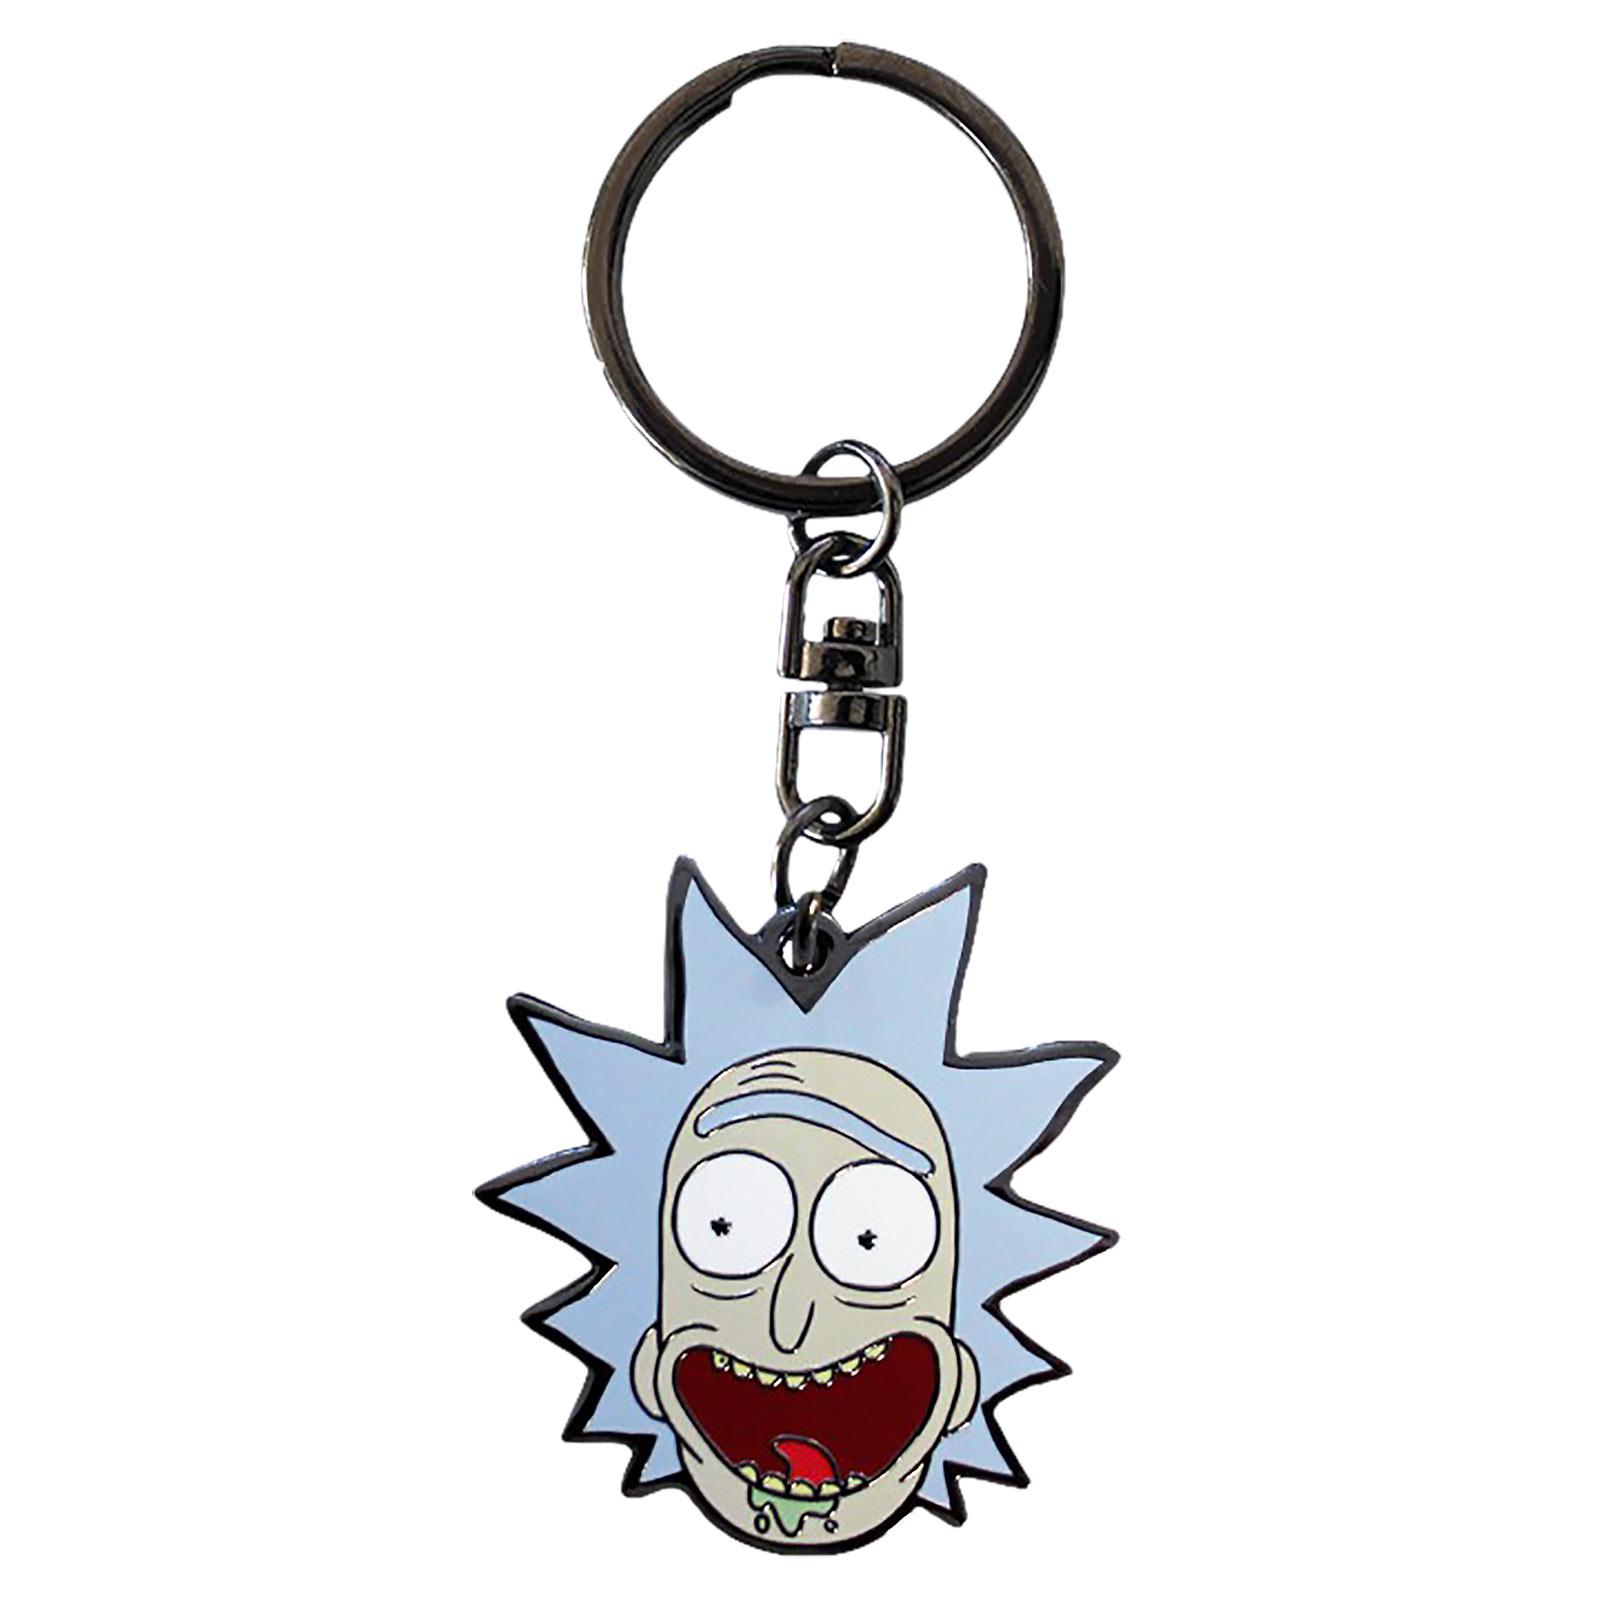 Rick and Morty - Rick Face Schlüsselanhänger